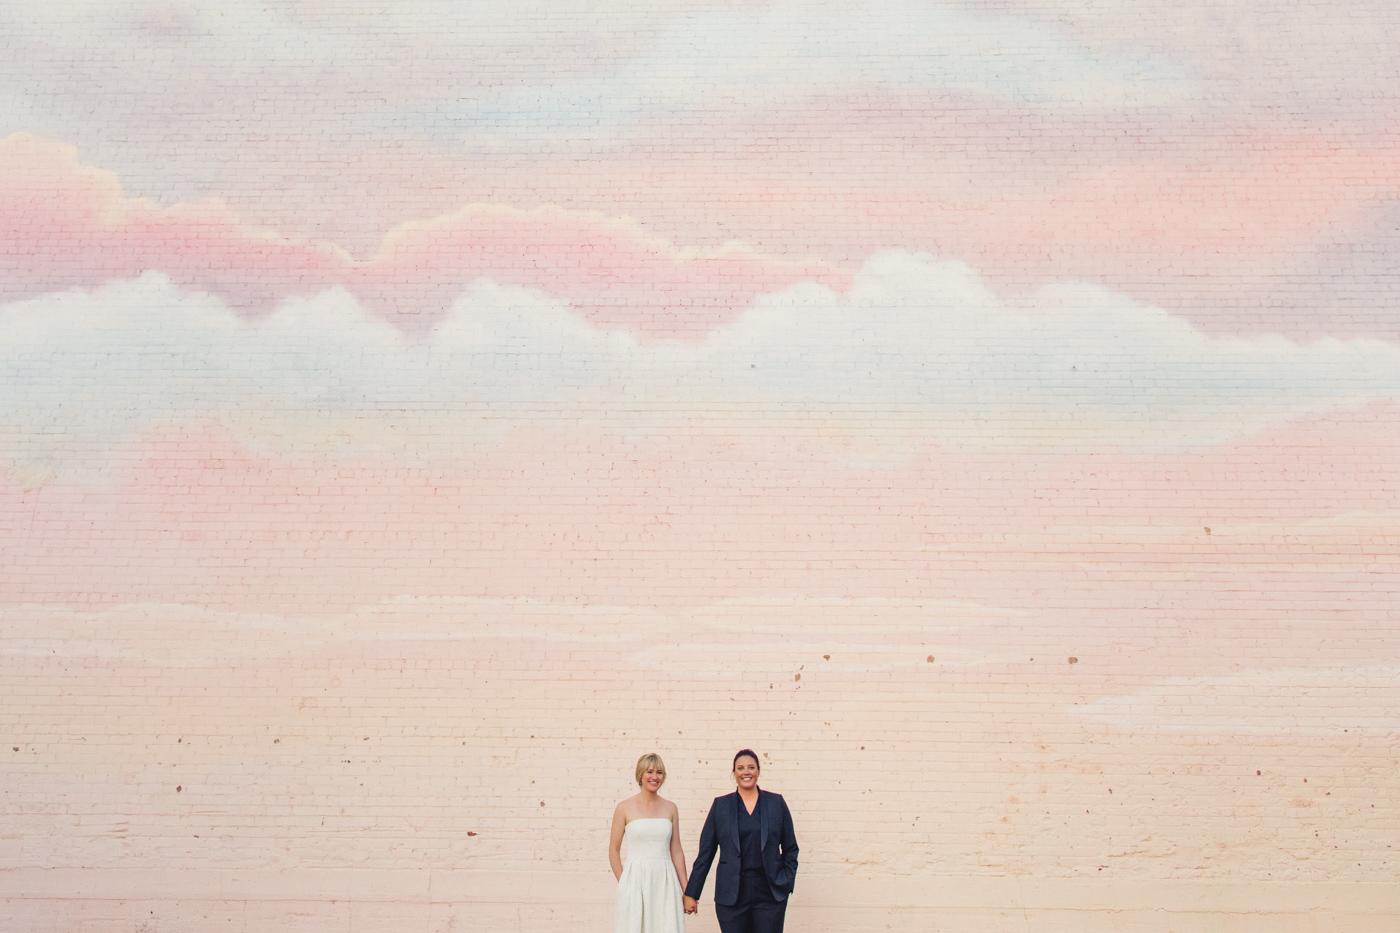 icehouse-wedding-mural-portrait-photo